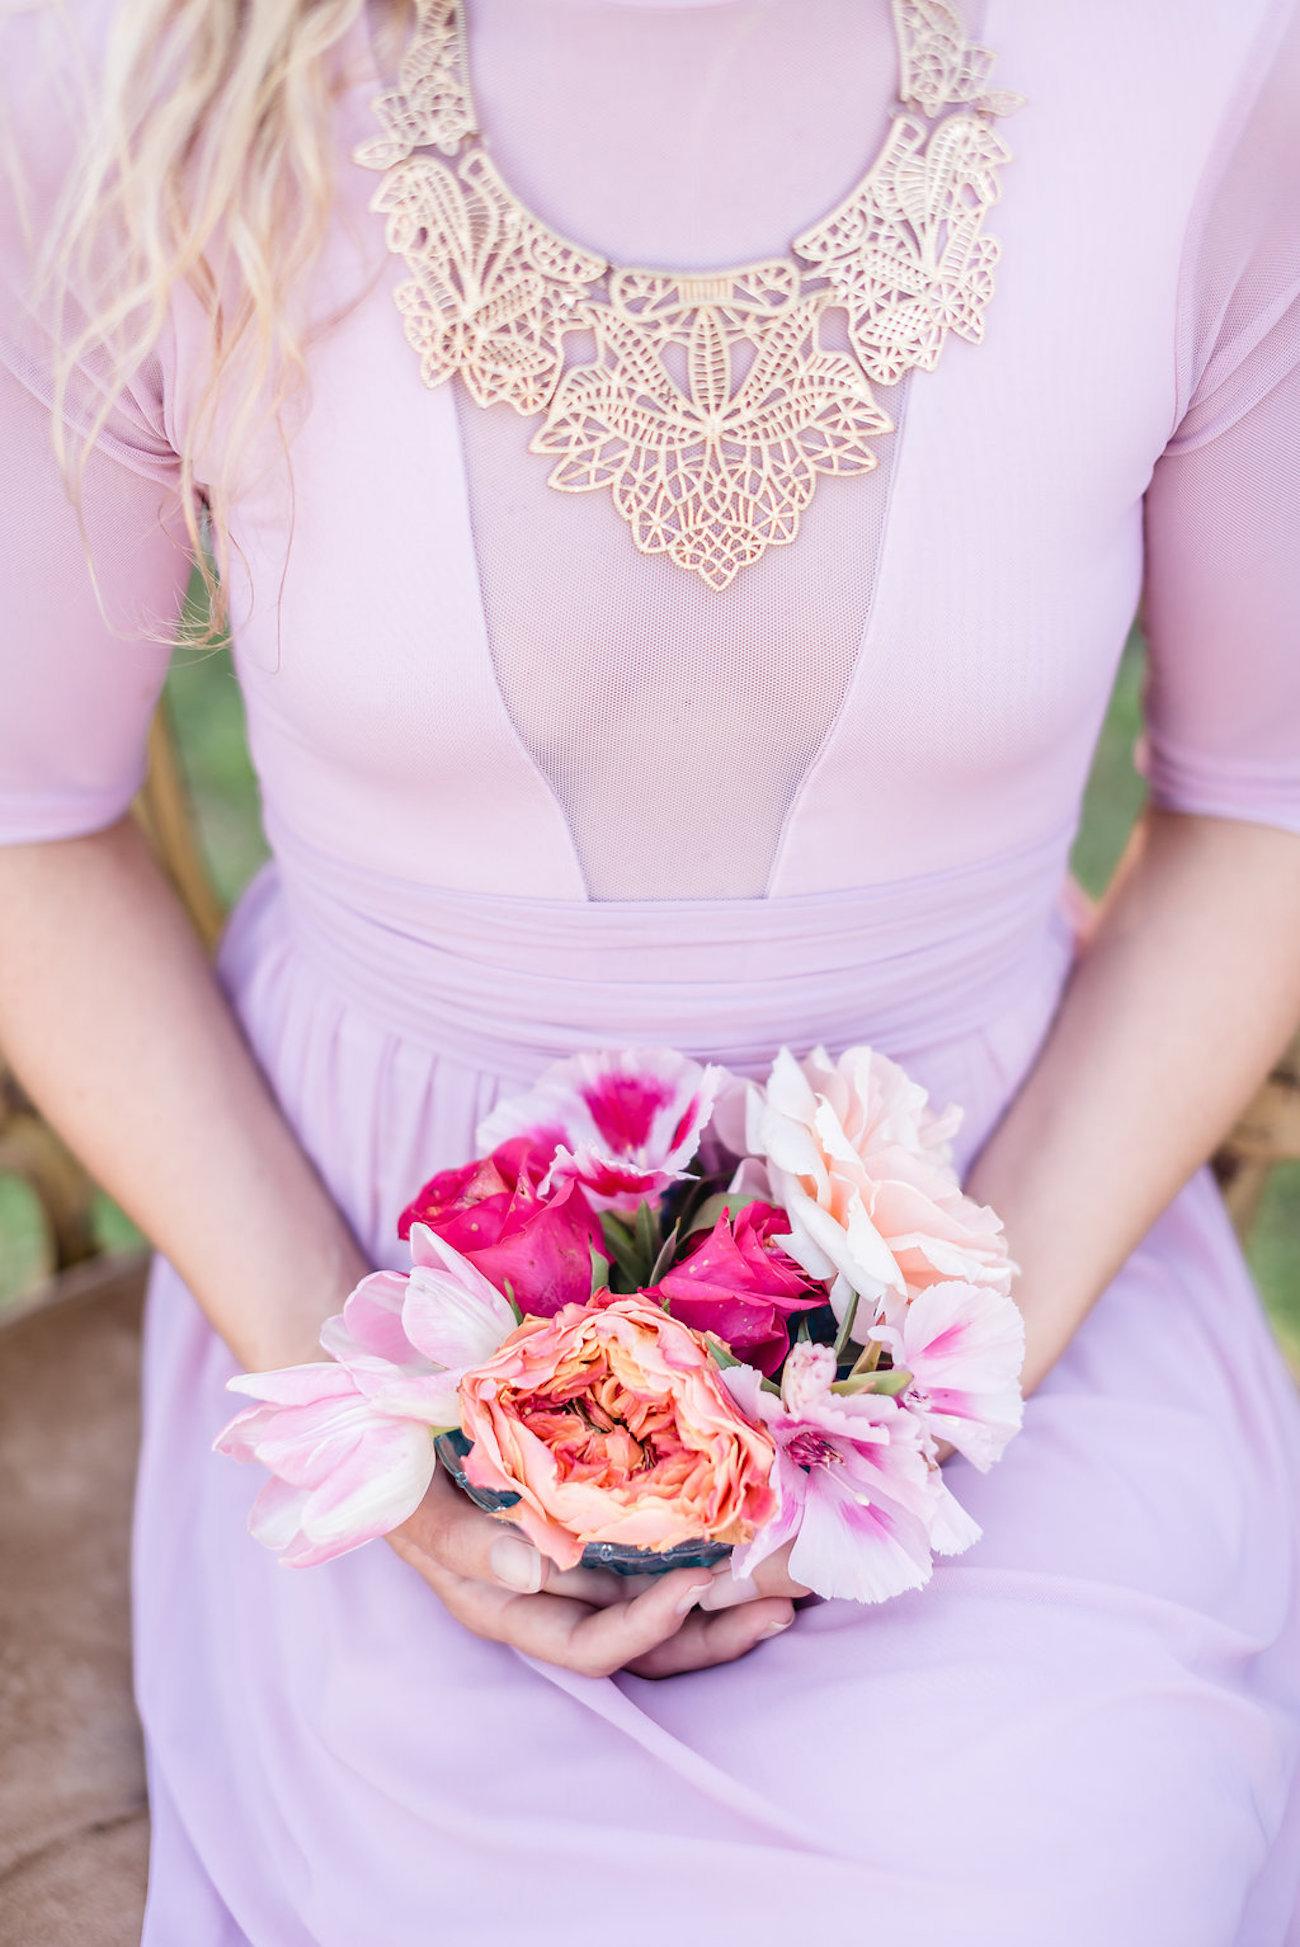 Pink Lace Bridesmaid or Wedding Dress | Credit: Jacoba Clothing/PhotoKru